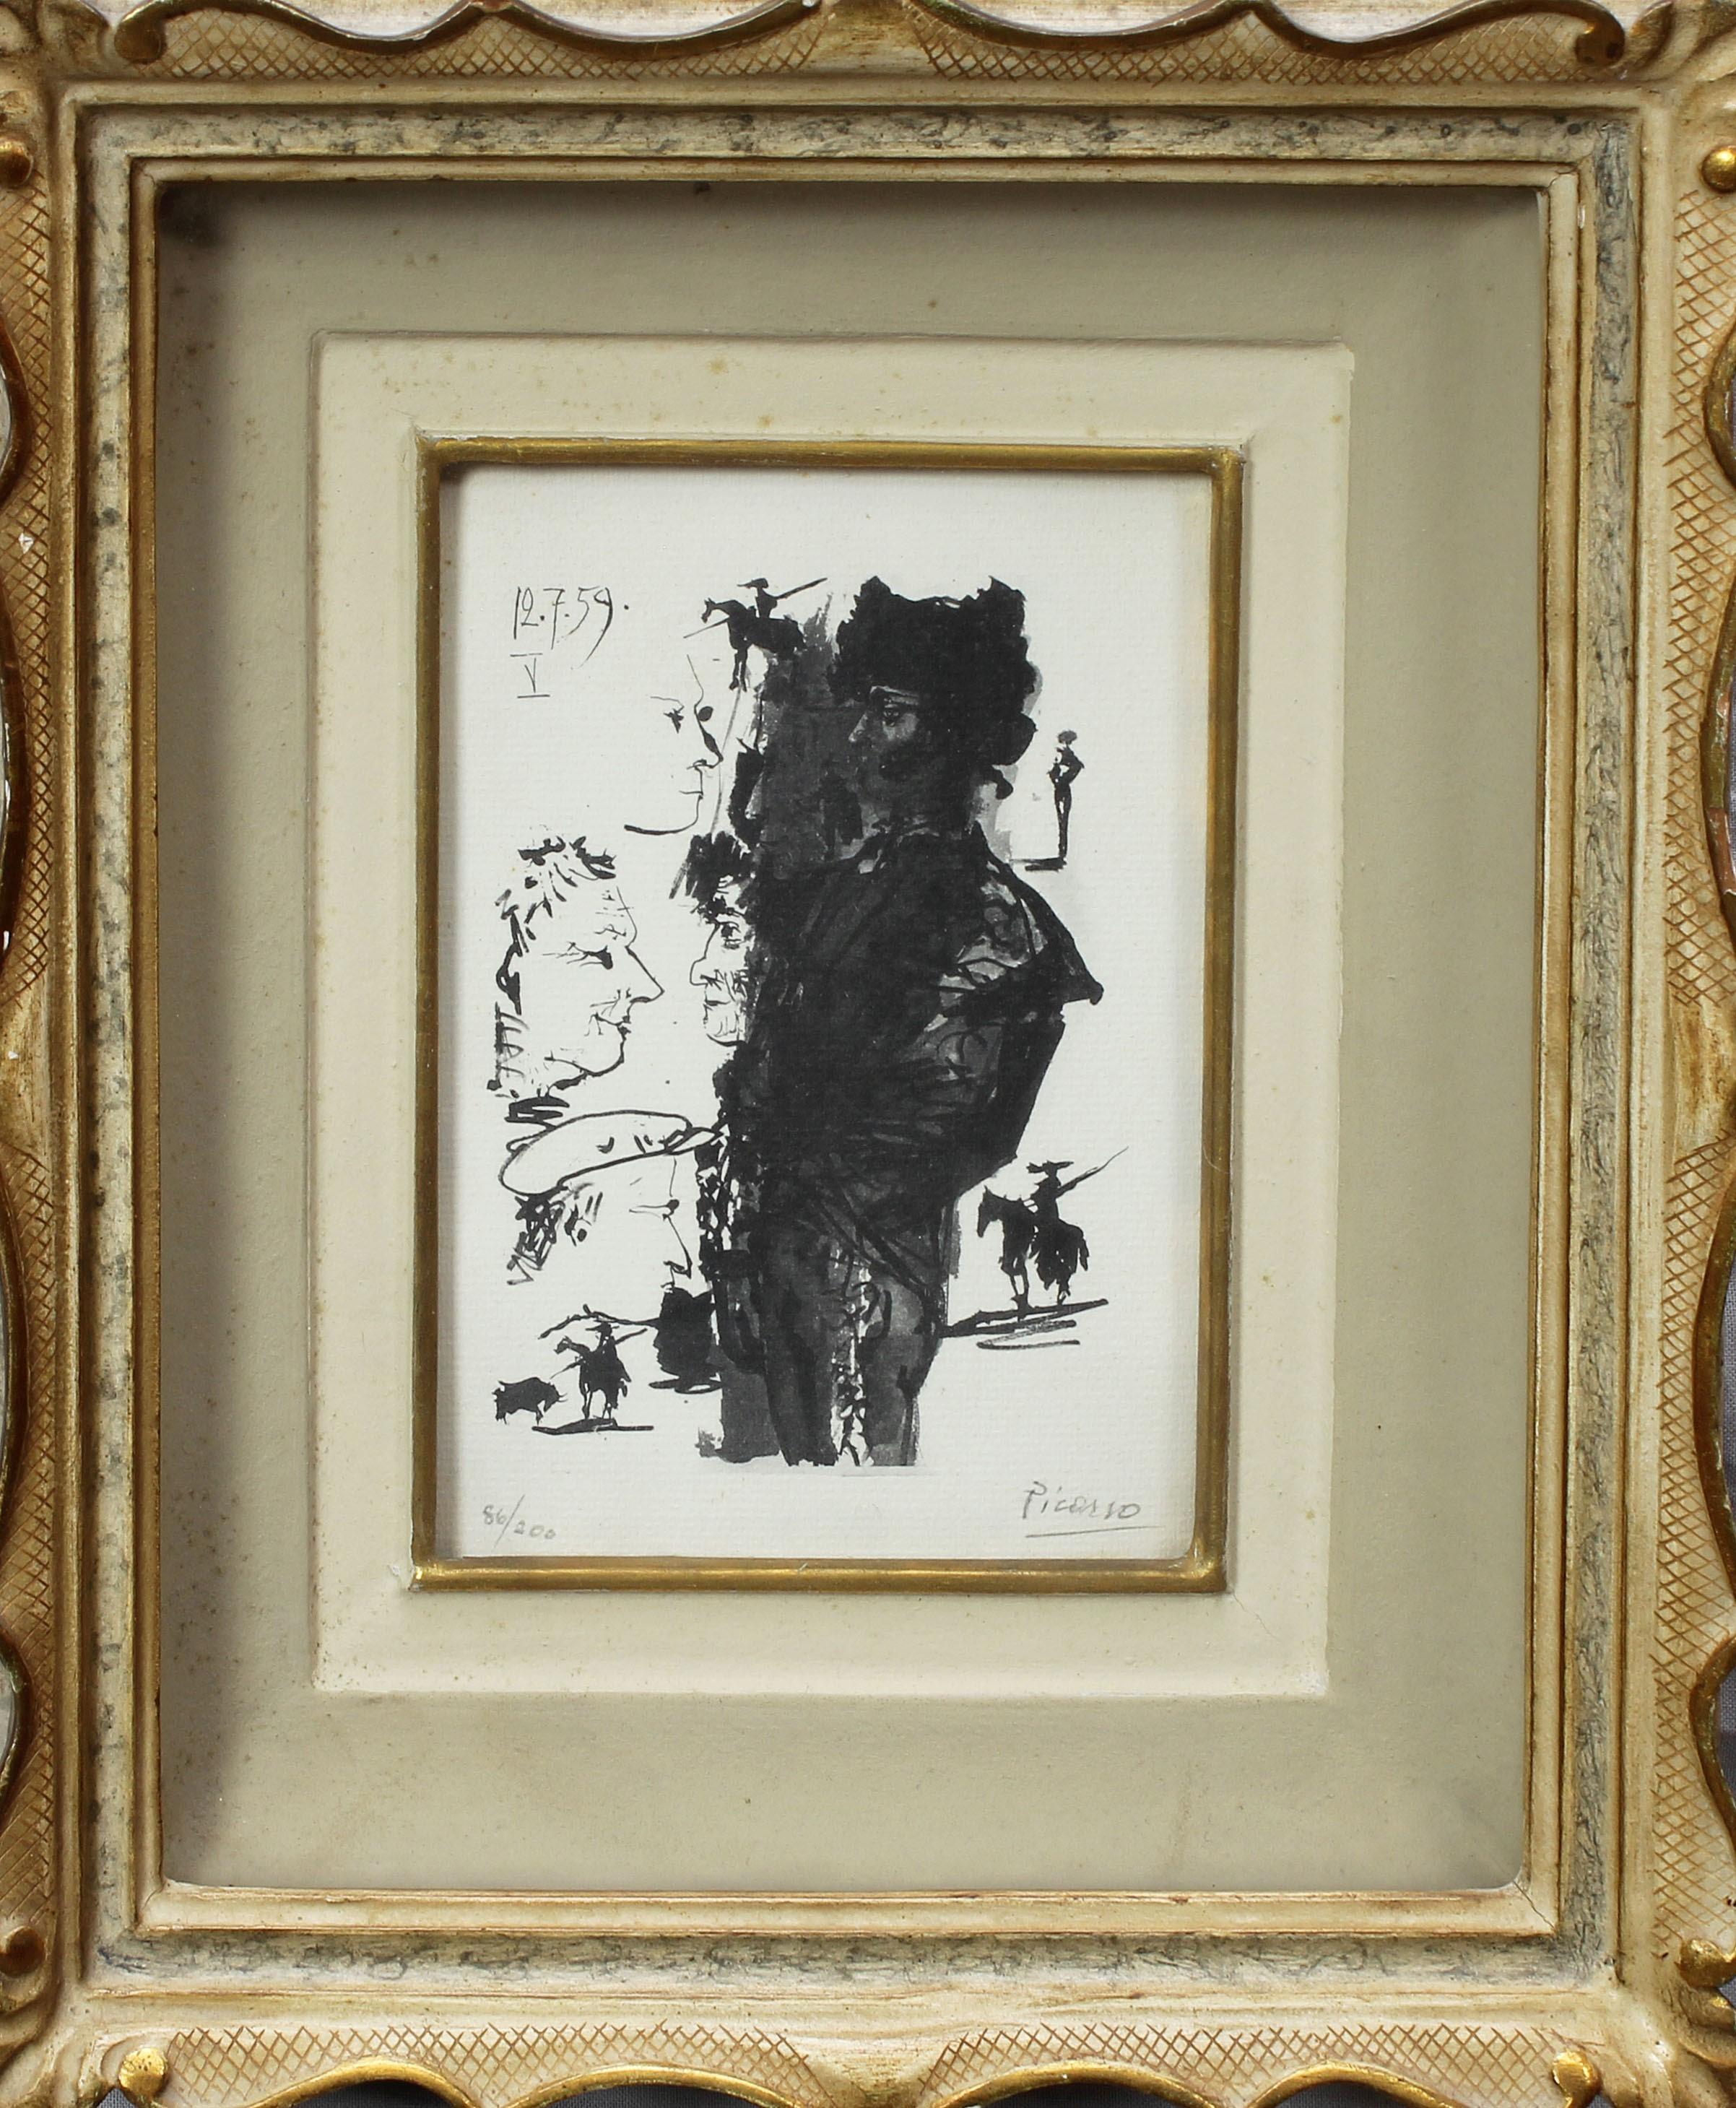 Lot 17 - Toreros, grafica 56/200 con firma a matita Picasso?, data 12.7.59, cm. 11x15